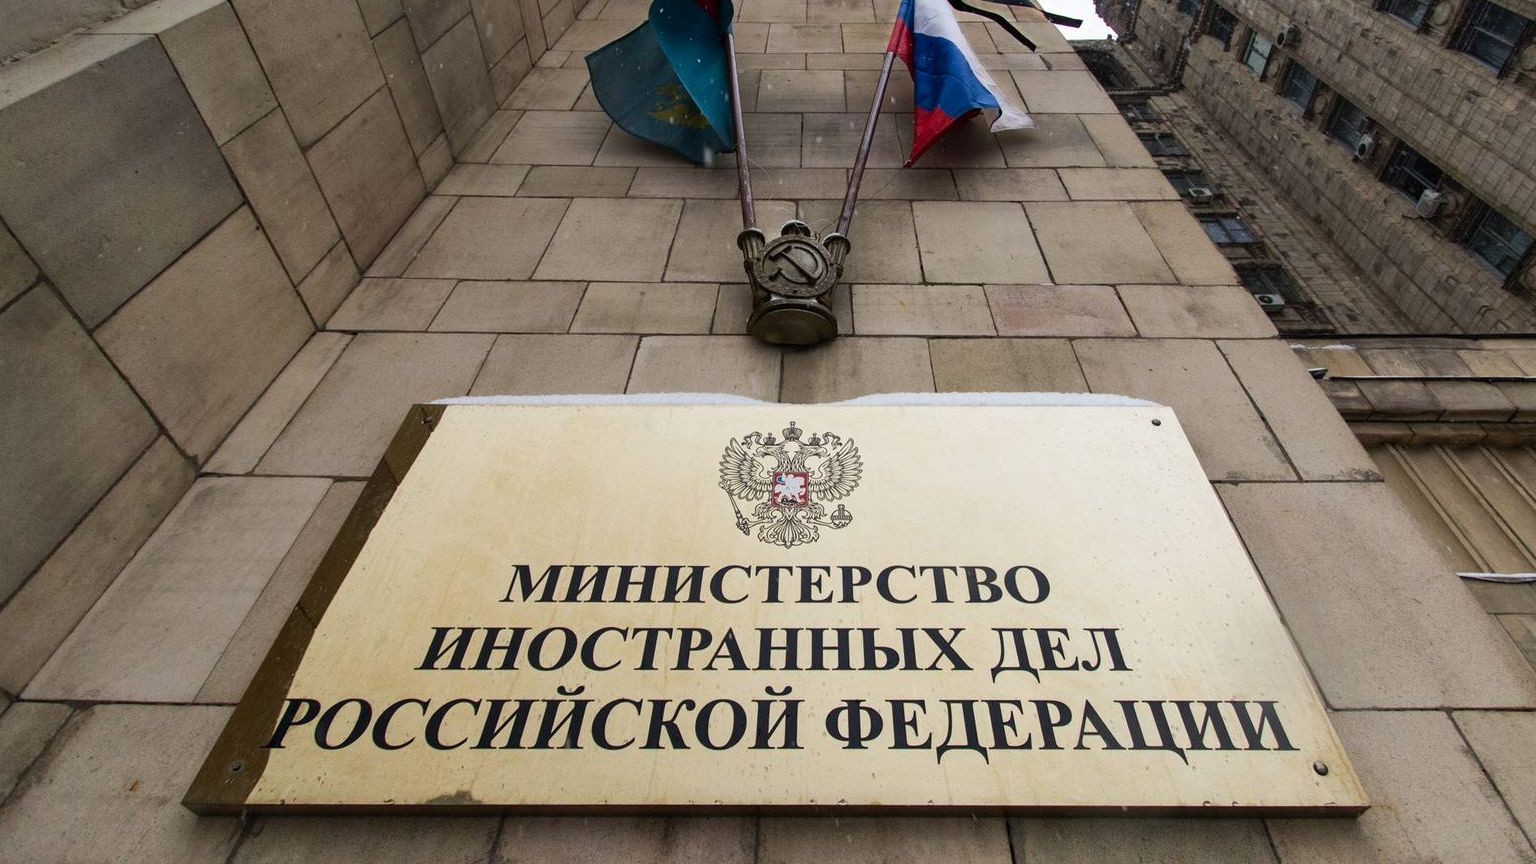 Руководителя МИДРФ иФРГ обсудят ситуацию вгосударстве Украина ивСирии